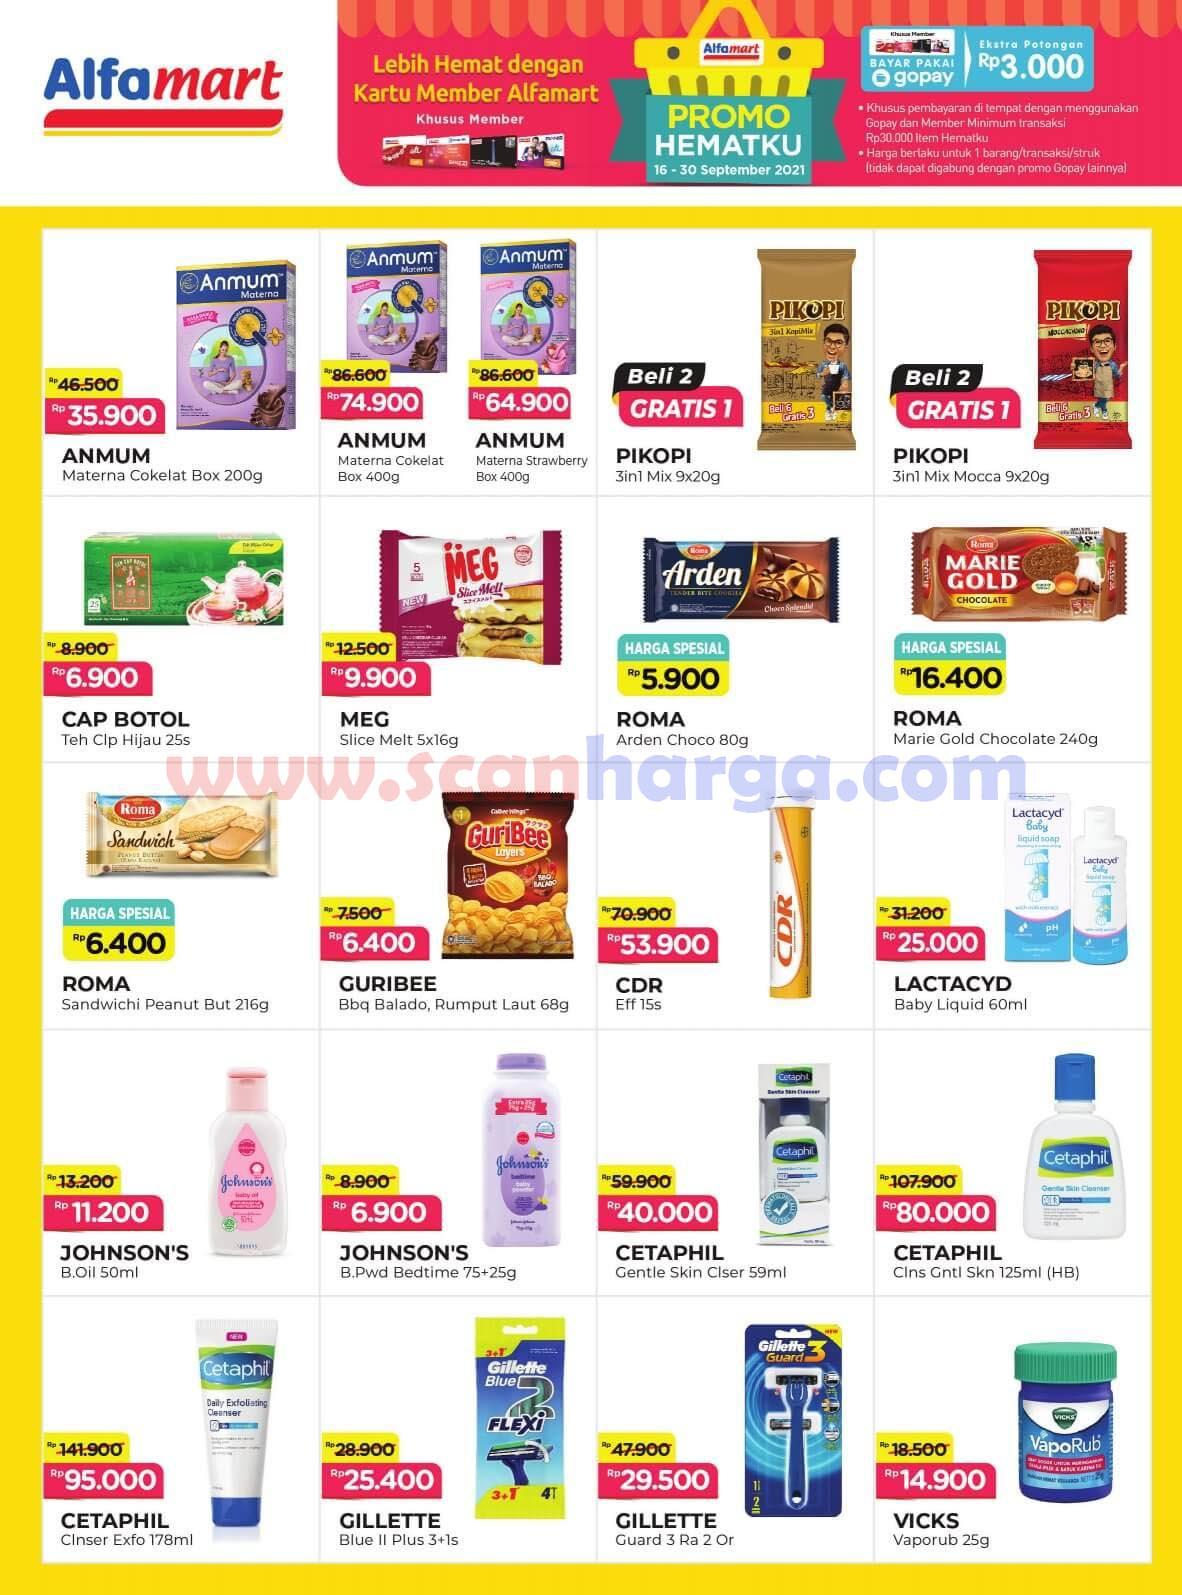 Katalog Promo Alfamart 16 - 30 September 2021 20